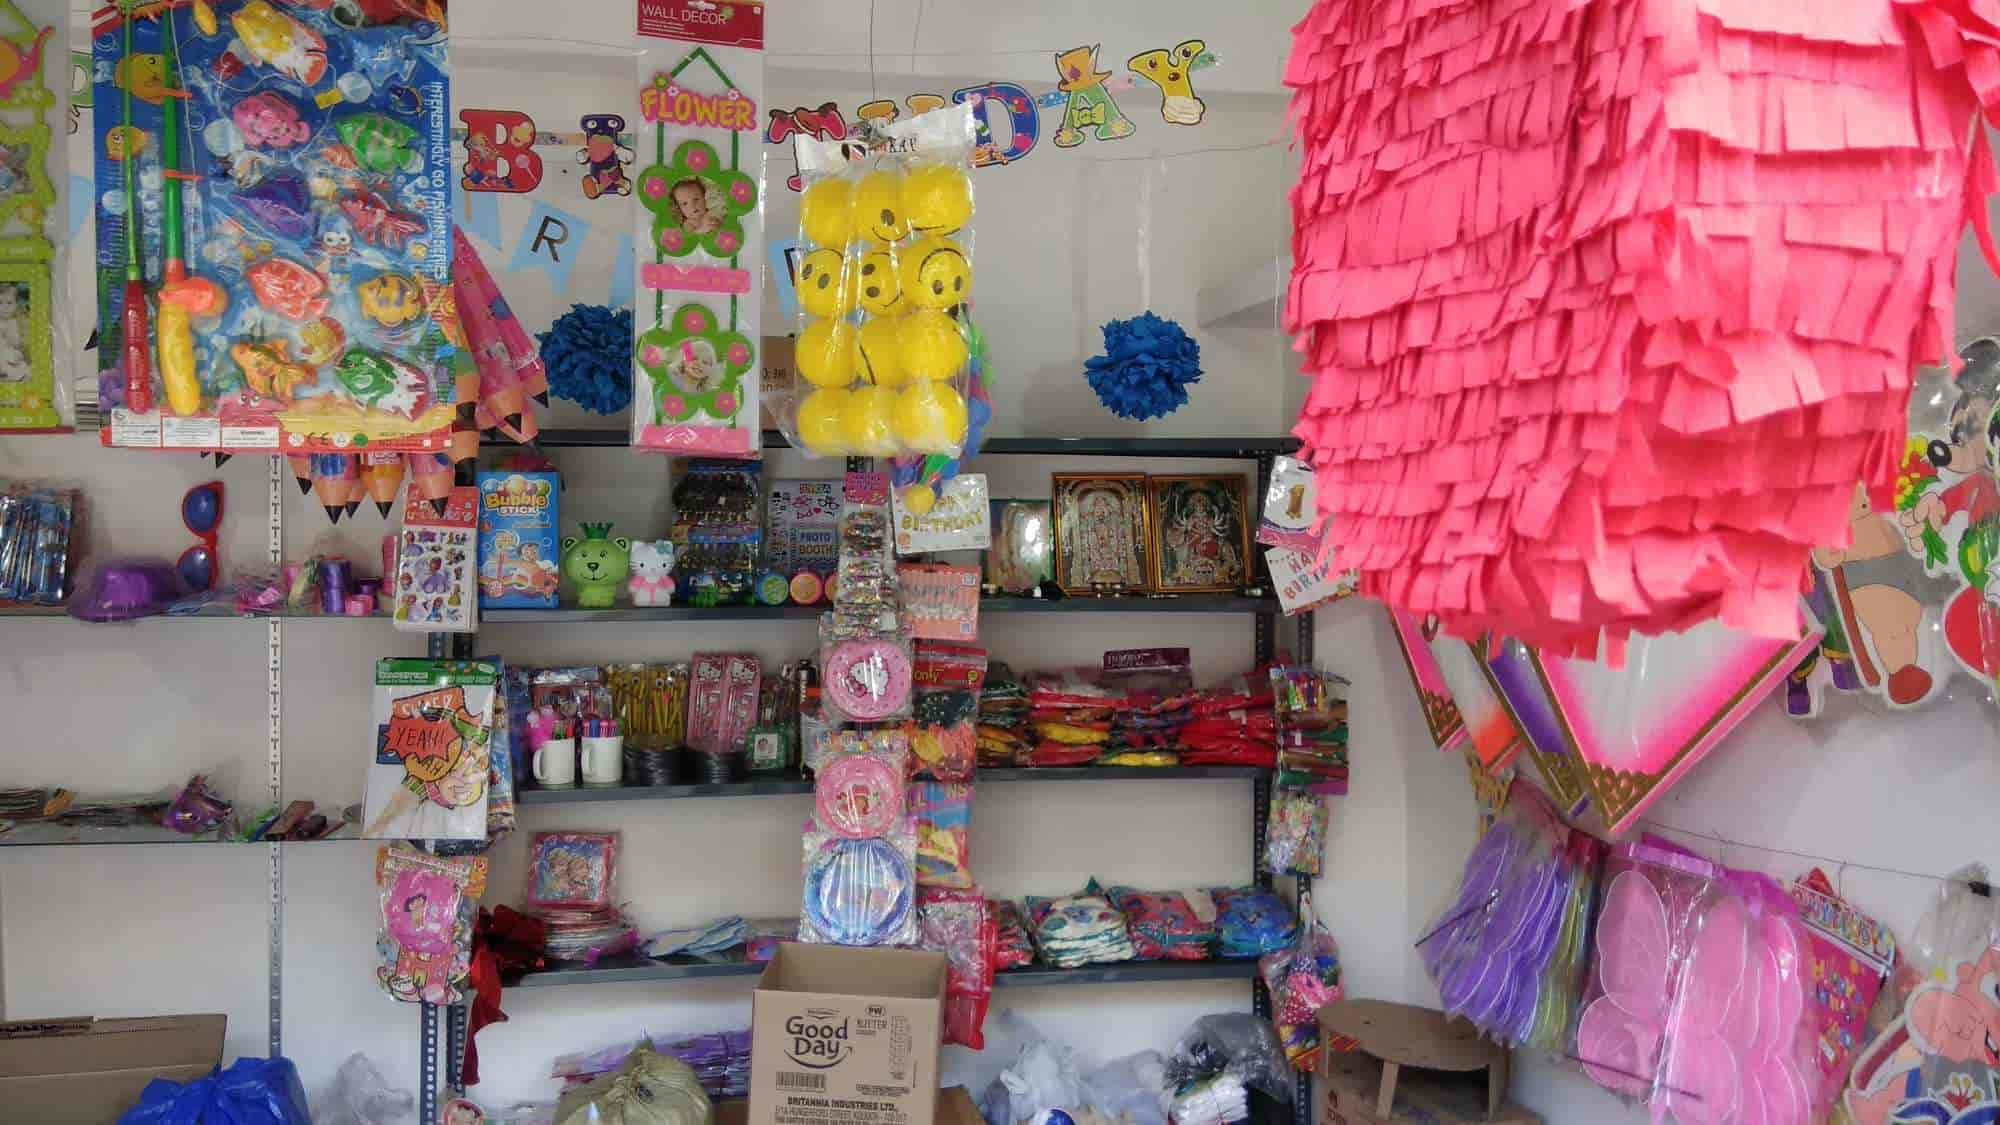 The Pinata Store Photos, Hulimavu, Bangalore- Pictures